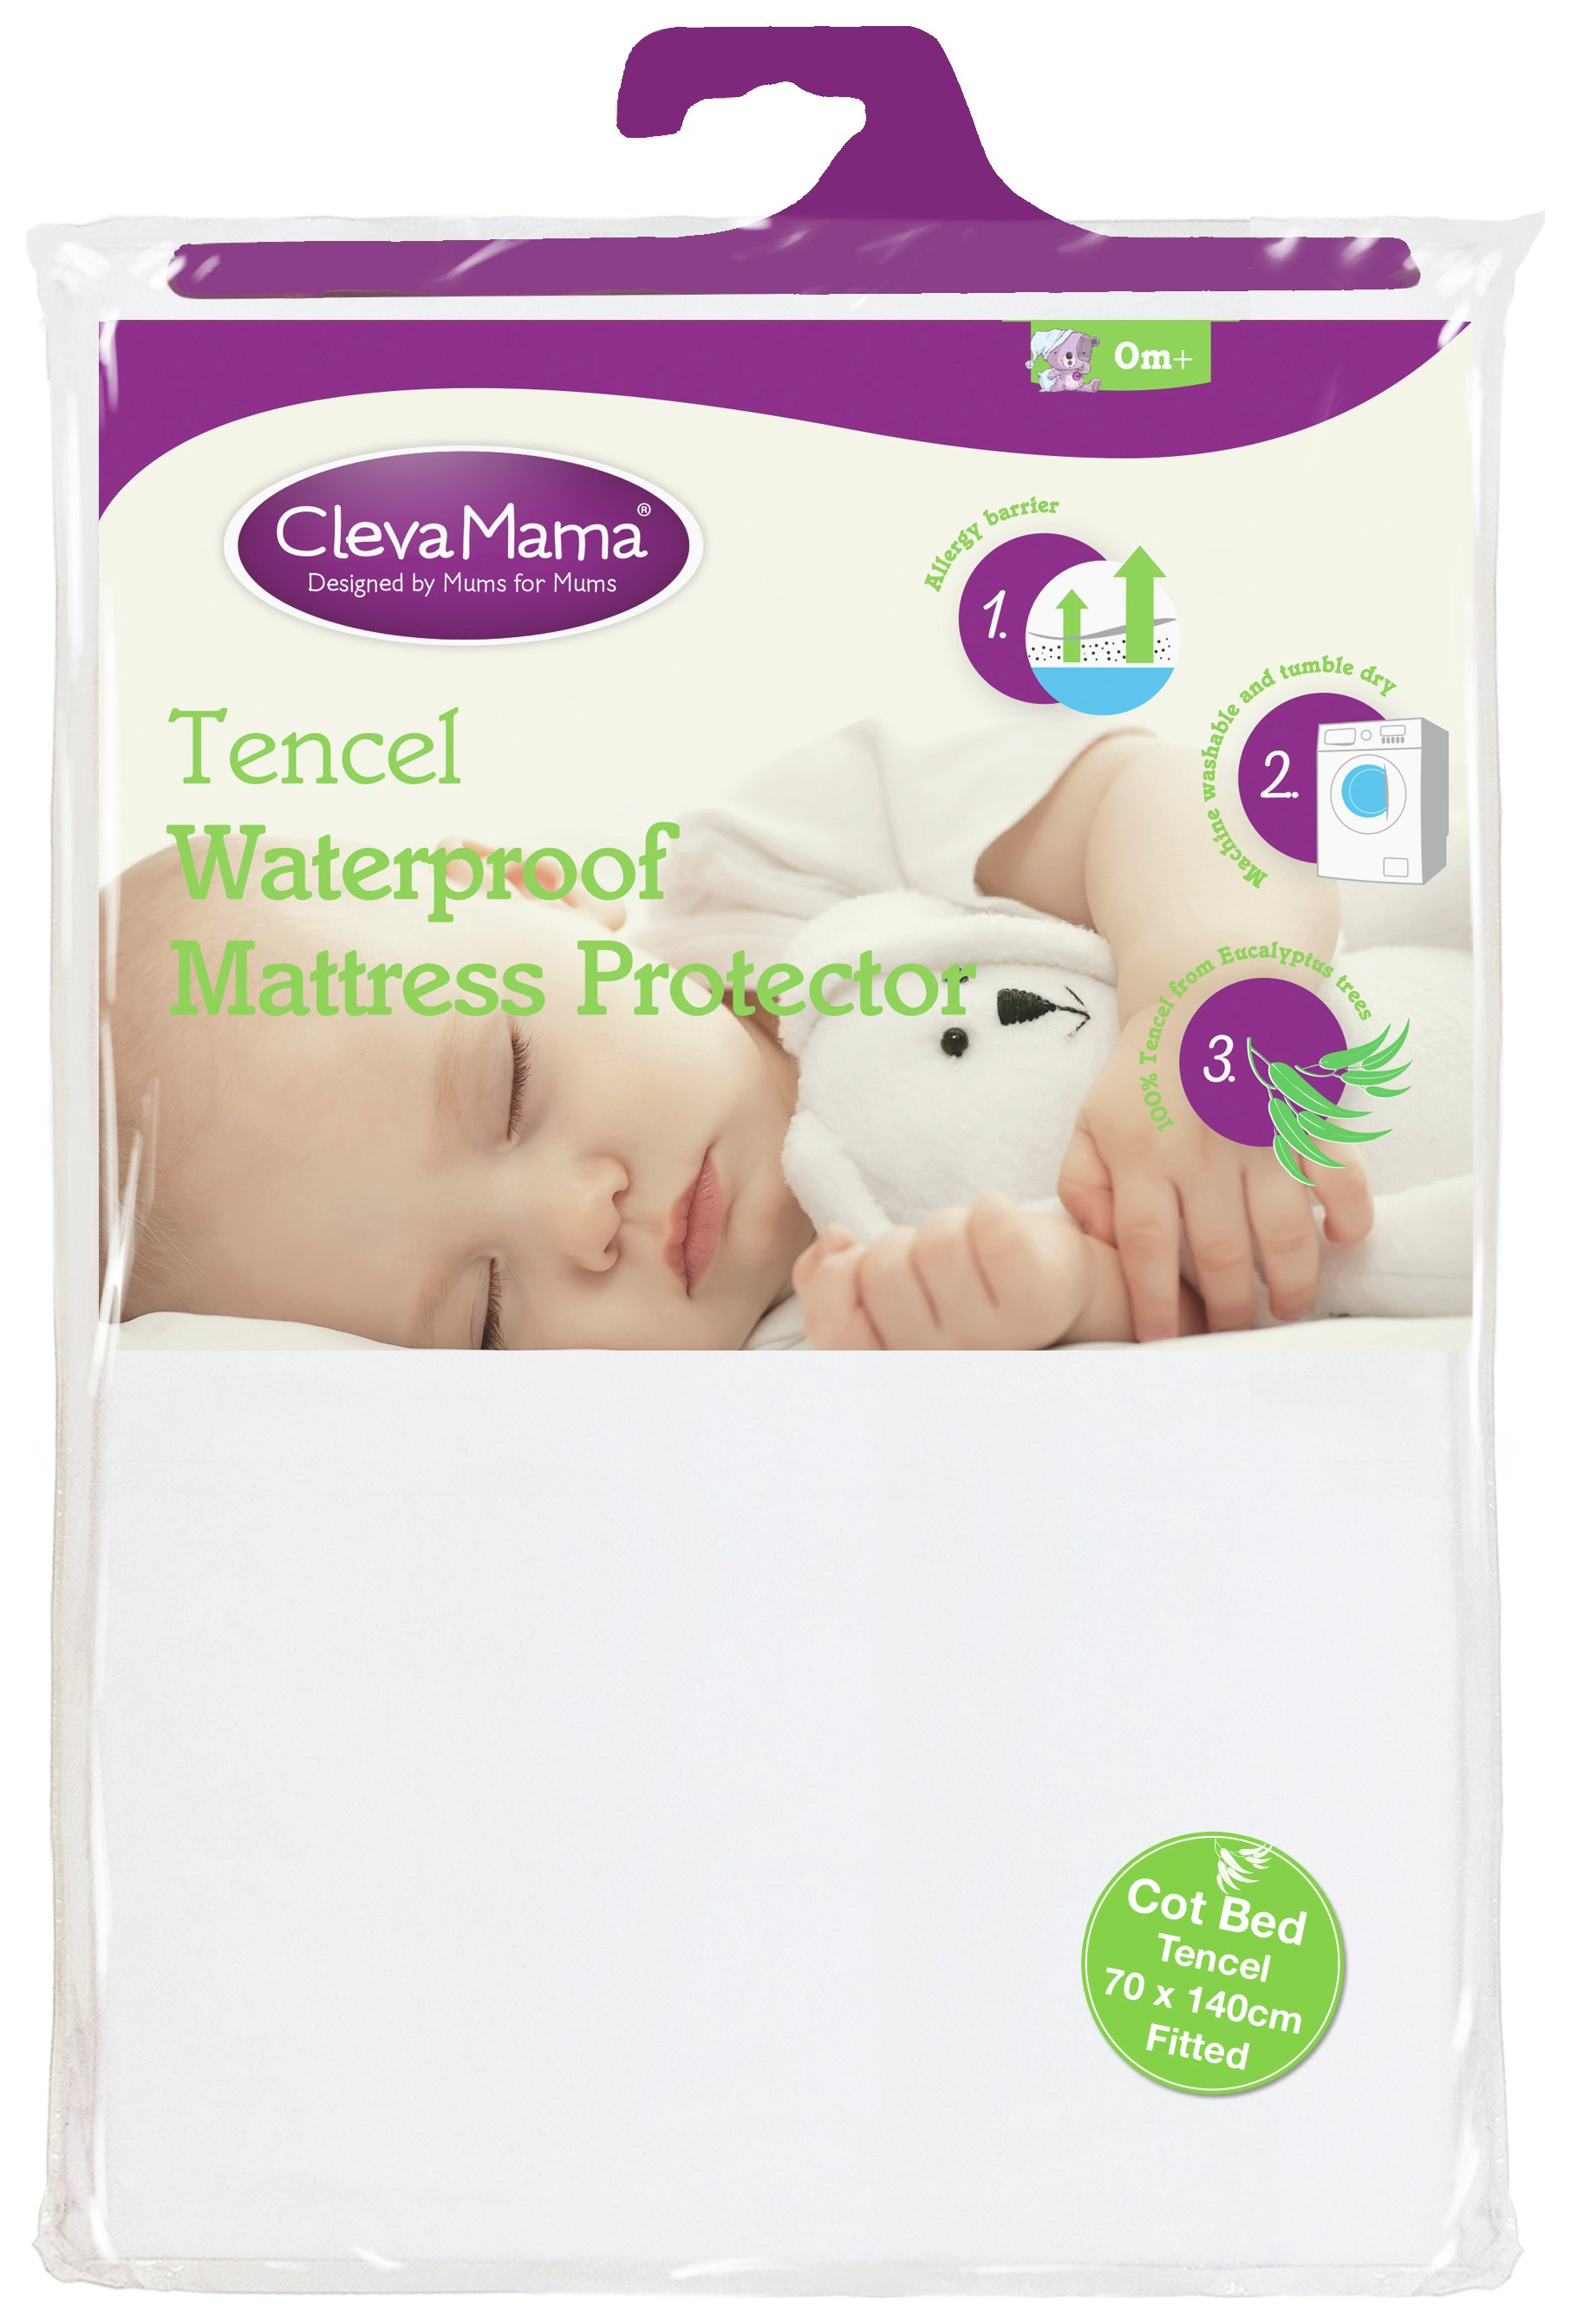 clevamama tencel waterproof mattress protector  cot bed